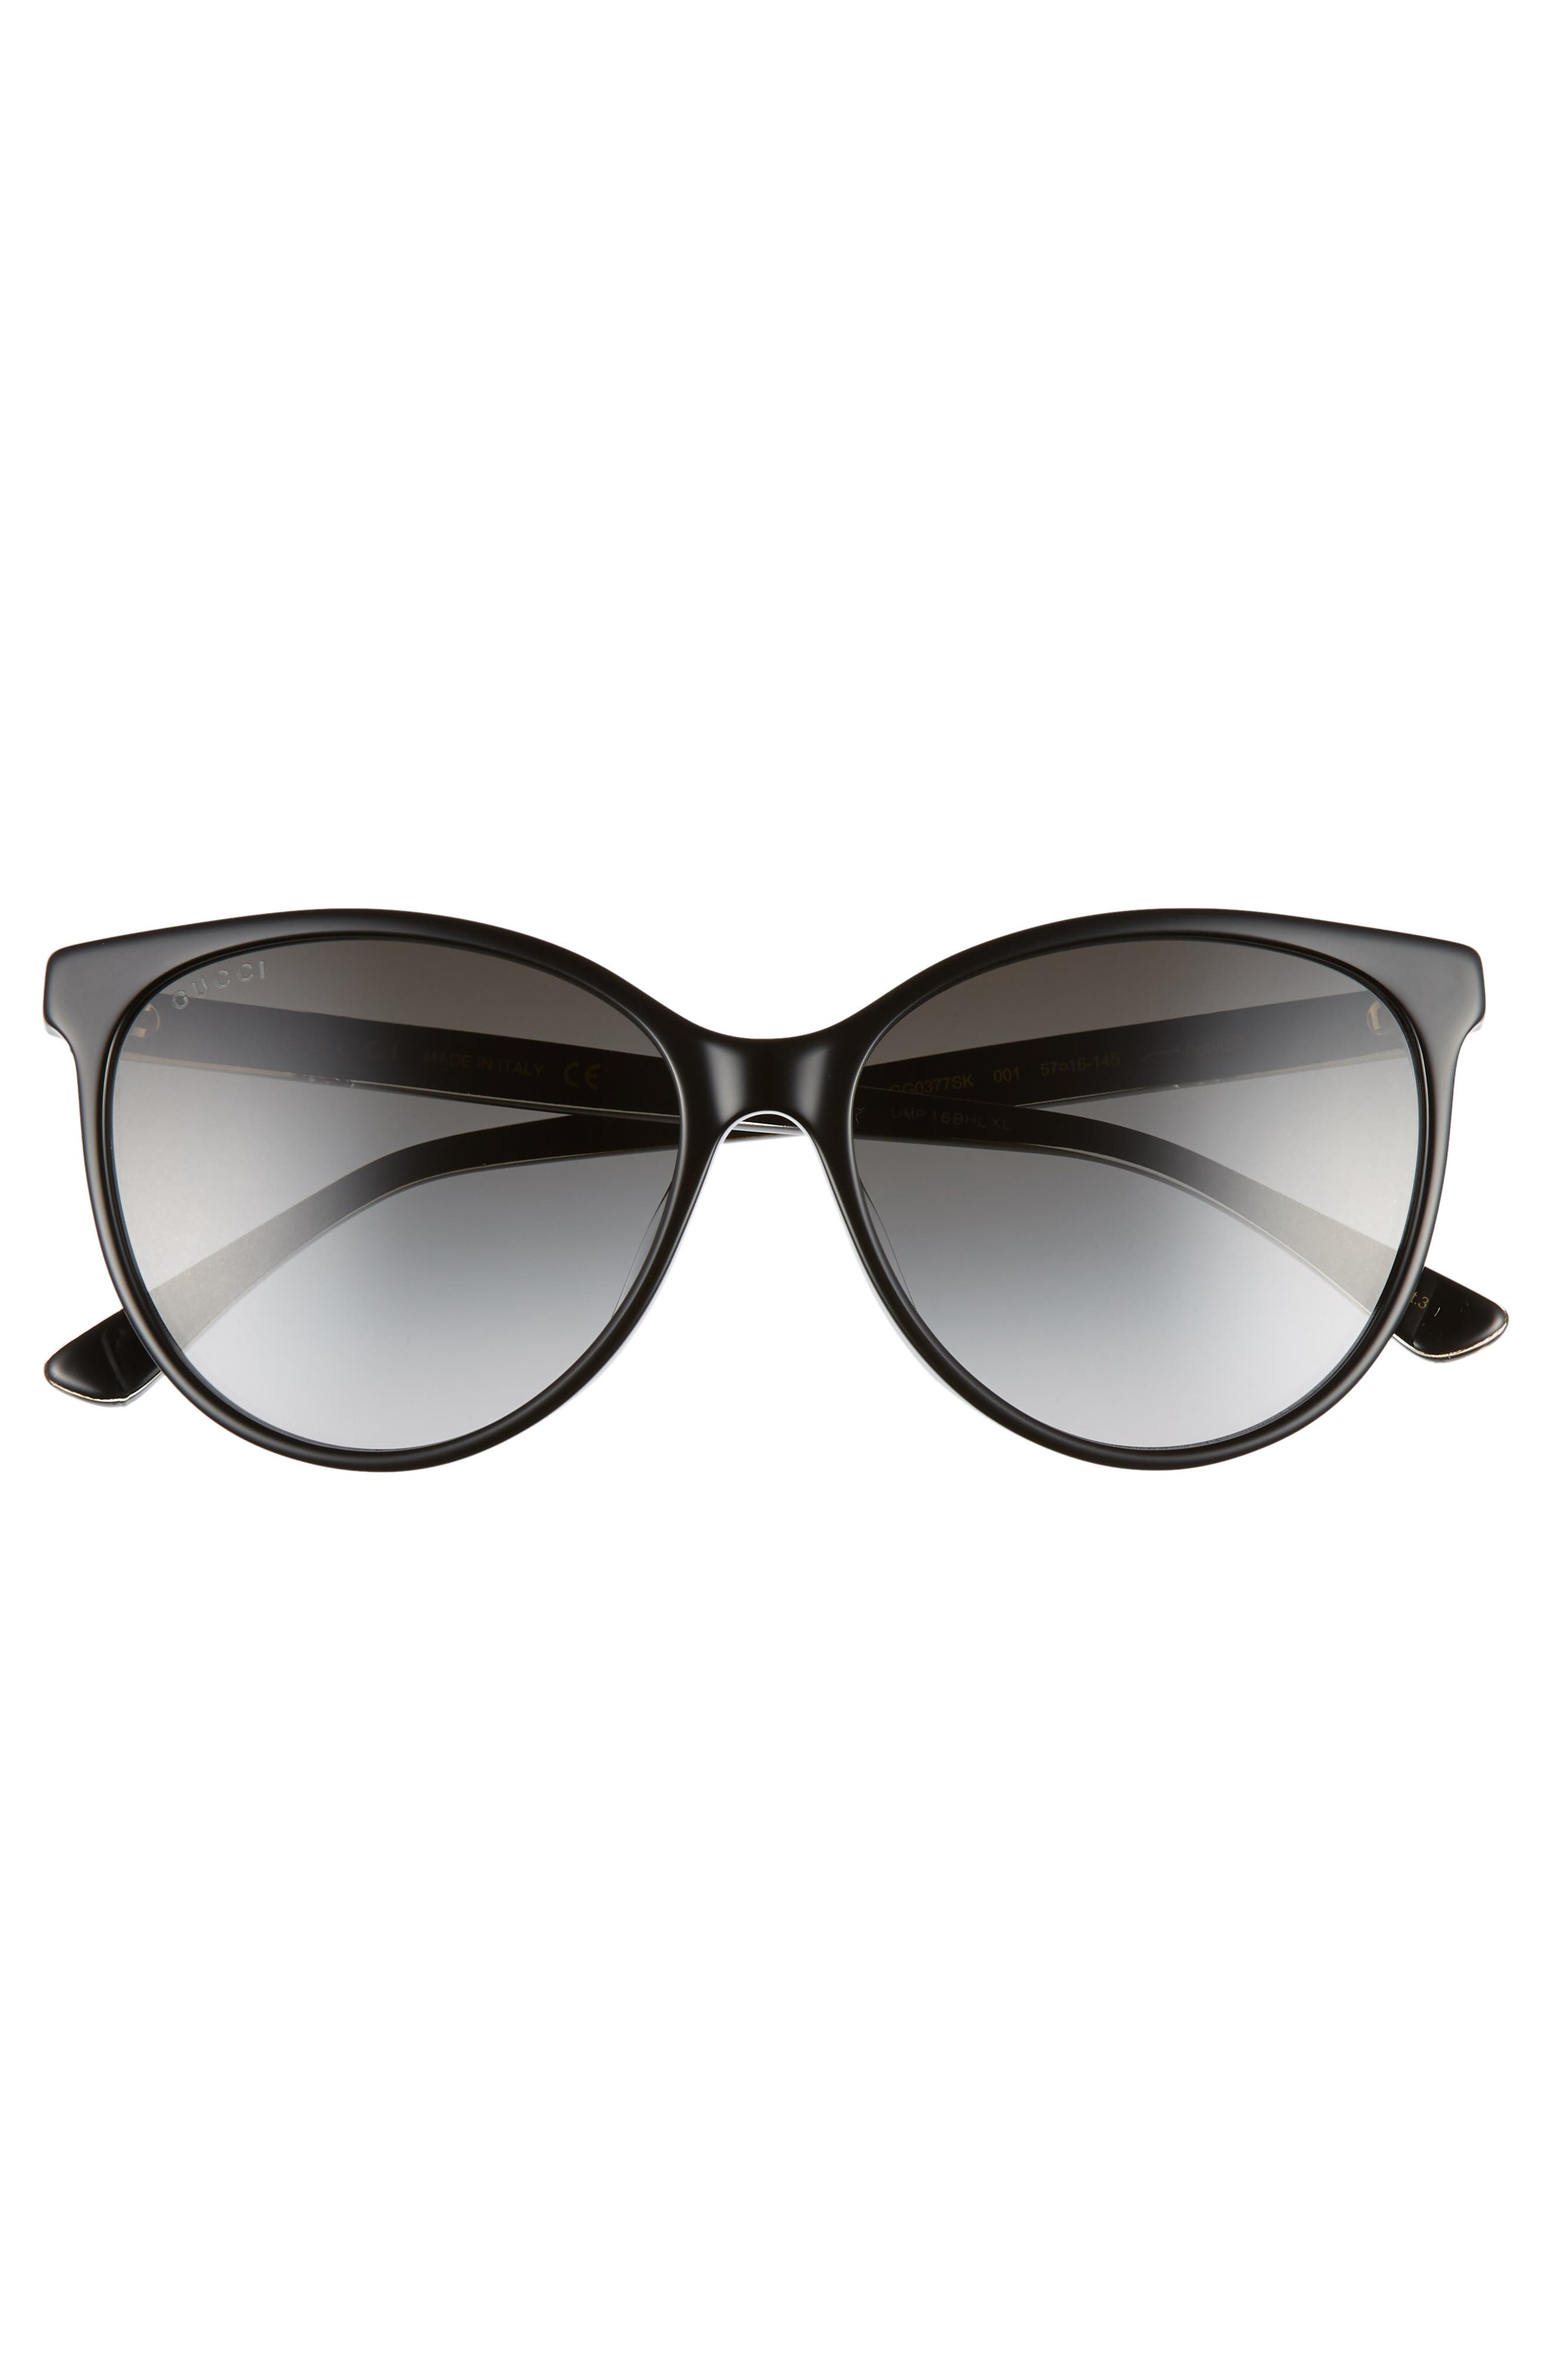 GUCCI,                             57mm Cat Eye Sunglasses,                             Alternate thumbnail 3, color,                             BLACK/ CRYSTAL/ GREY GRADIENT